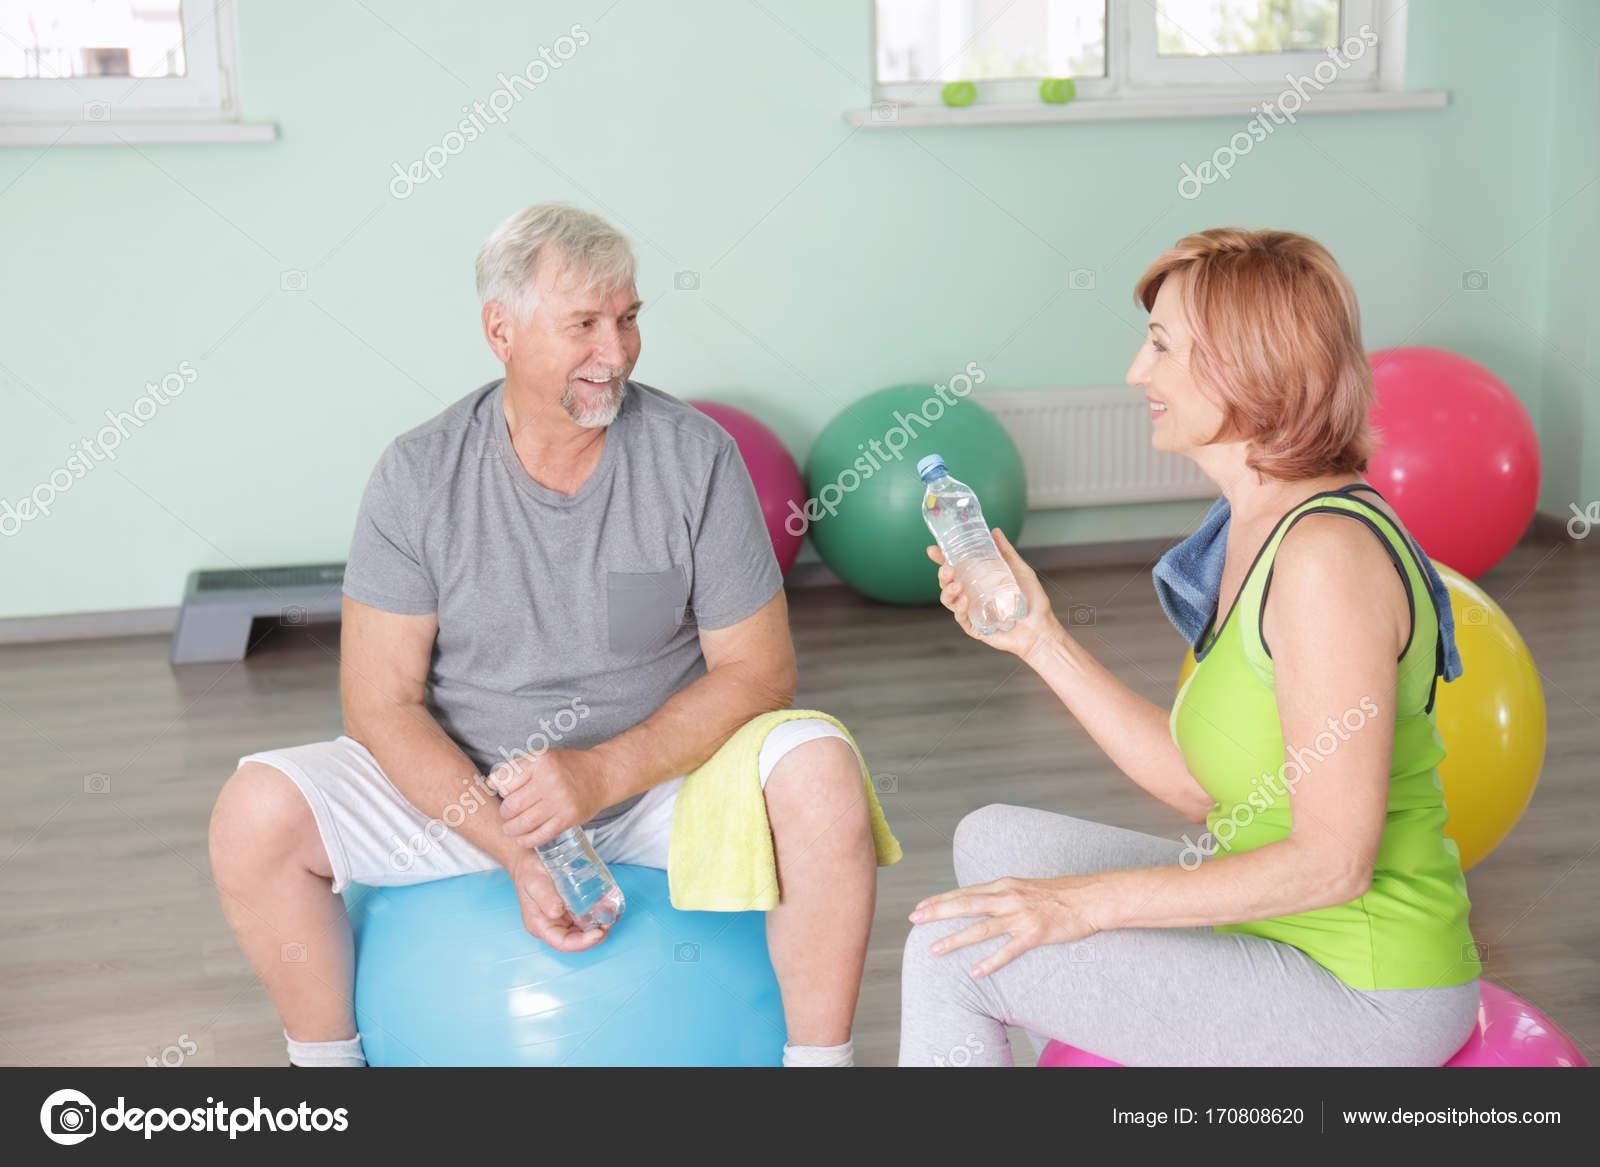 38154c6c4e11 Ώριμη γυναίκα και άντρας στο γυμναστήριο — Φωτογραφία Αρχείου ...